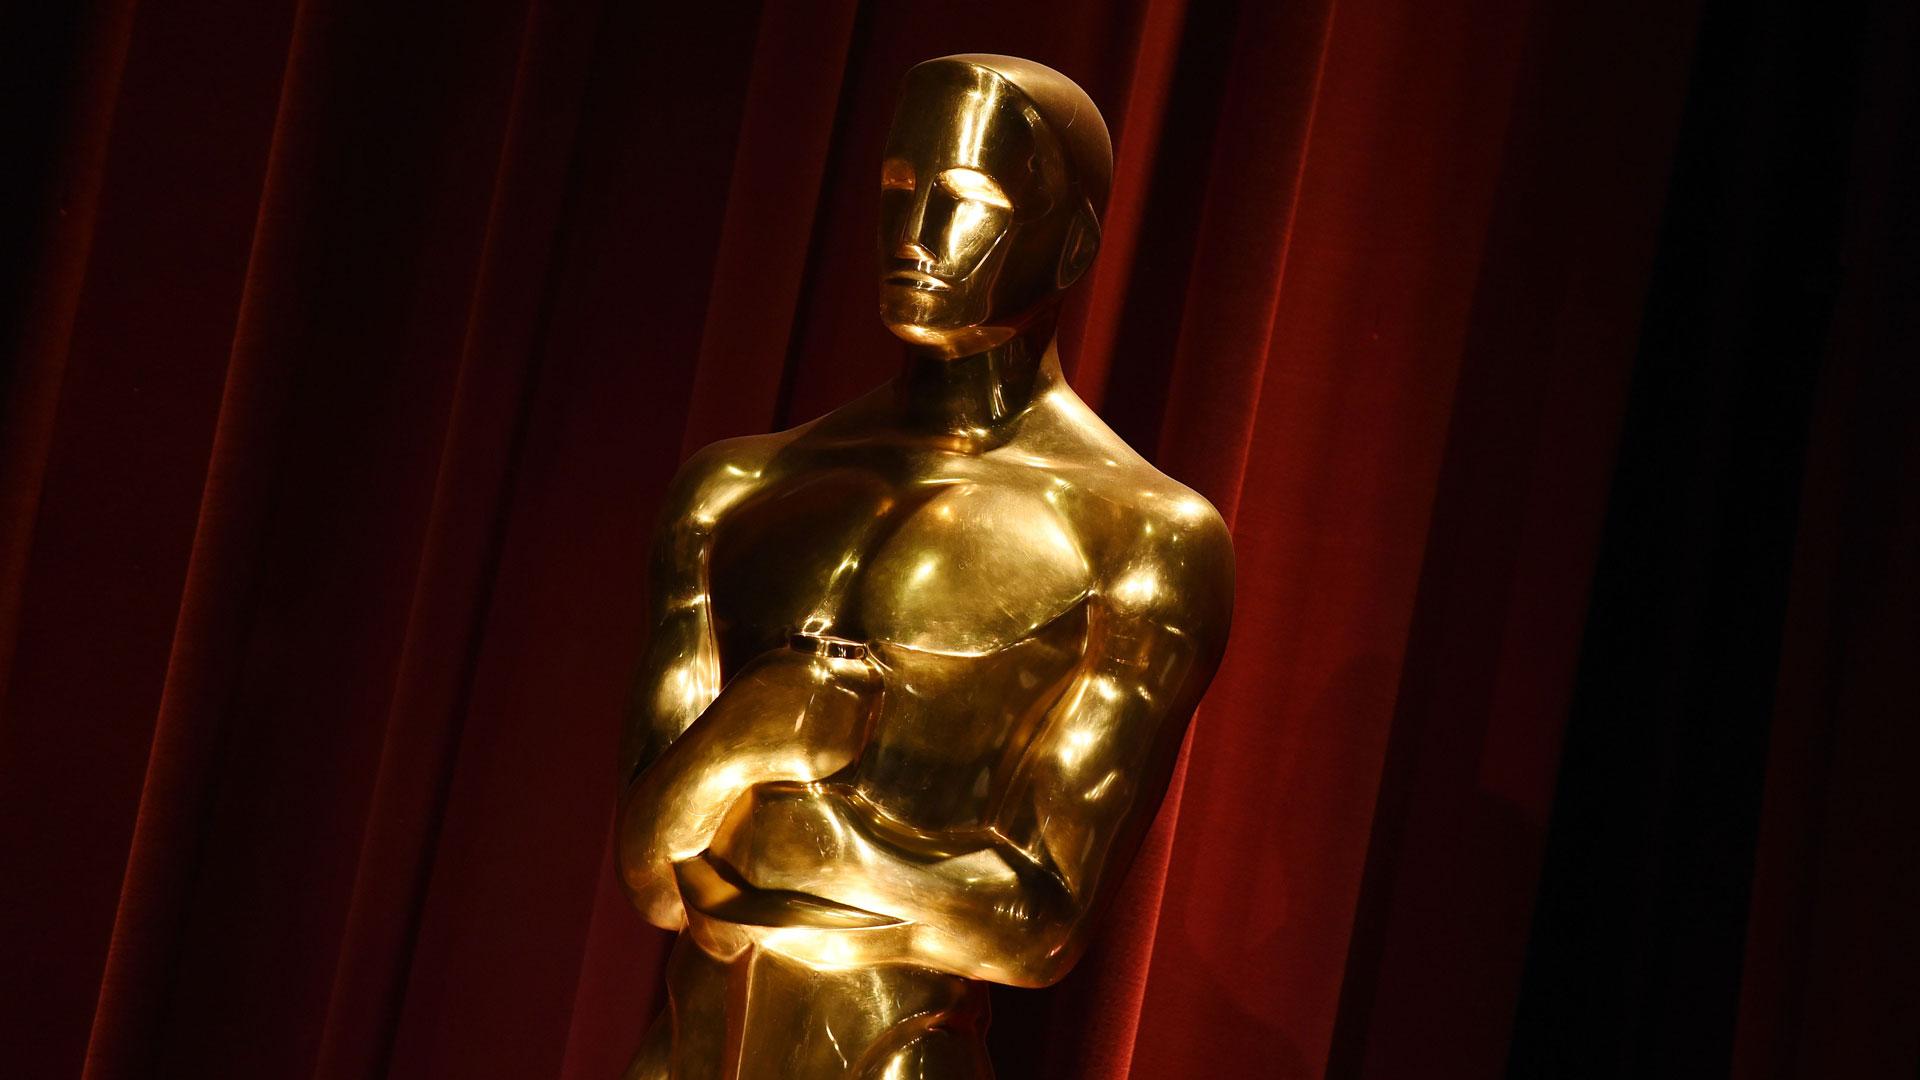 Die Oscar-Preisverleihung 2016 findet am 28. Februar statt.